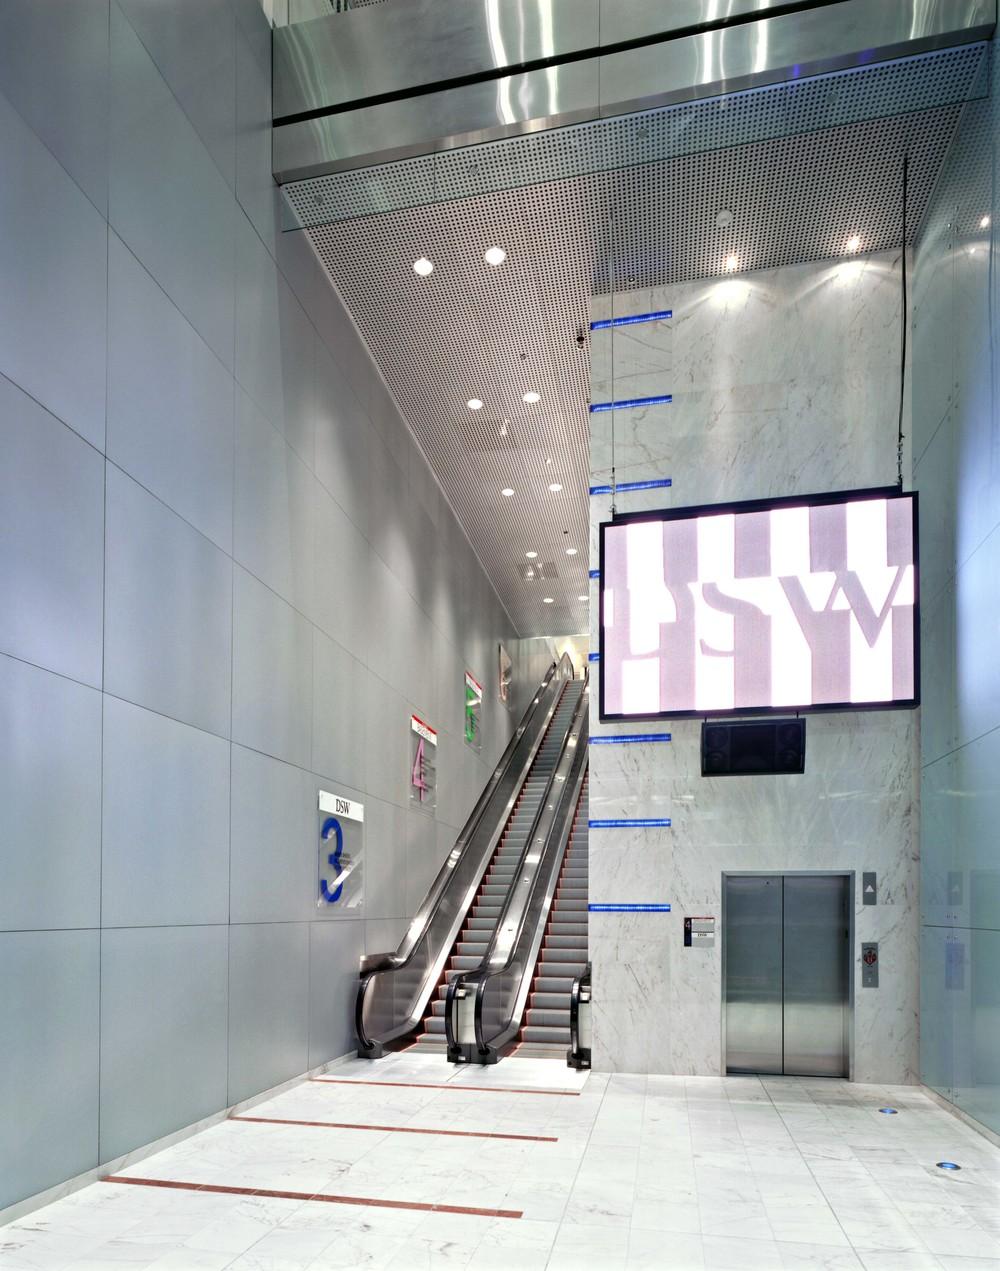 DSW Filenes Basement Union Square - Escalator 1.jpg